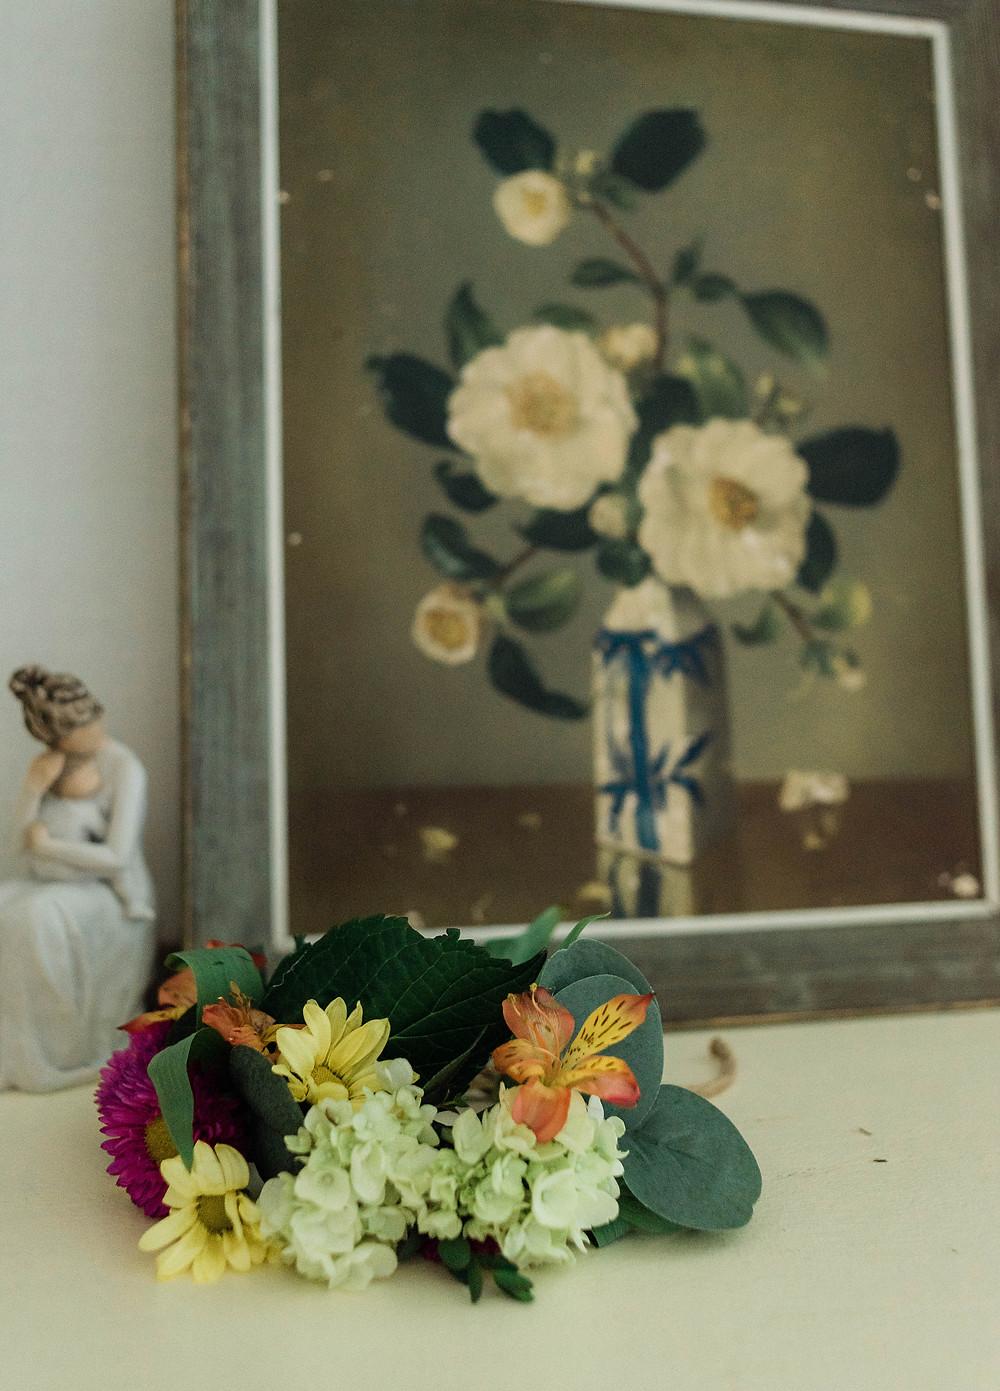 Floral crown for newborn portraits.